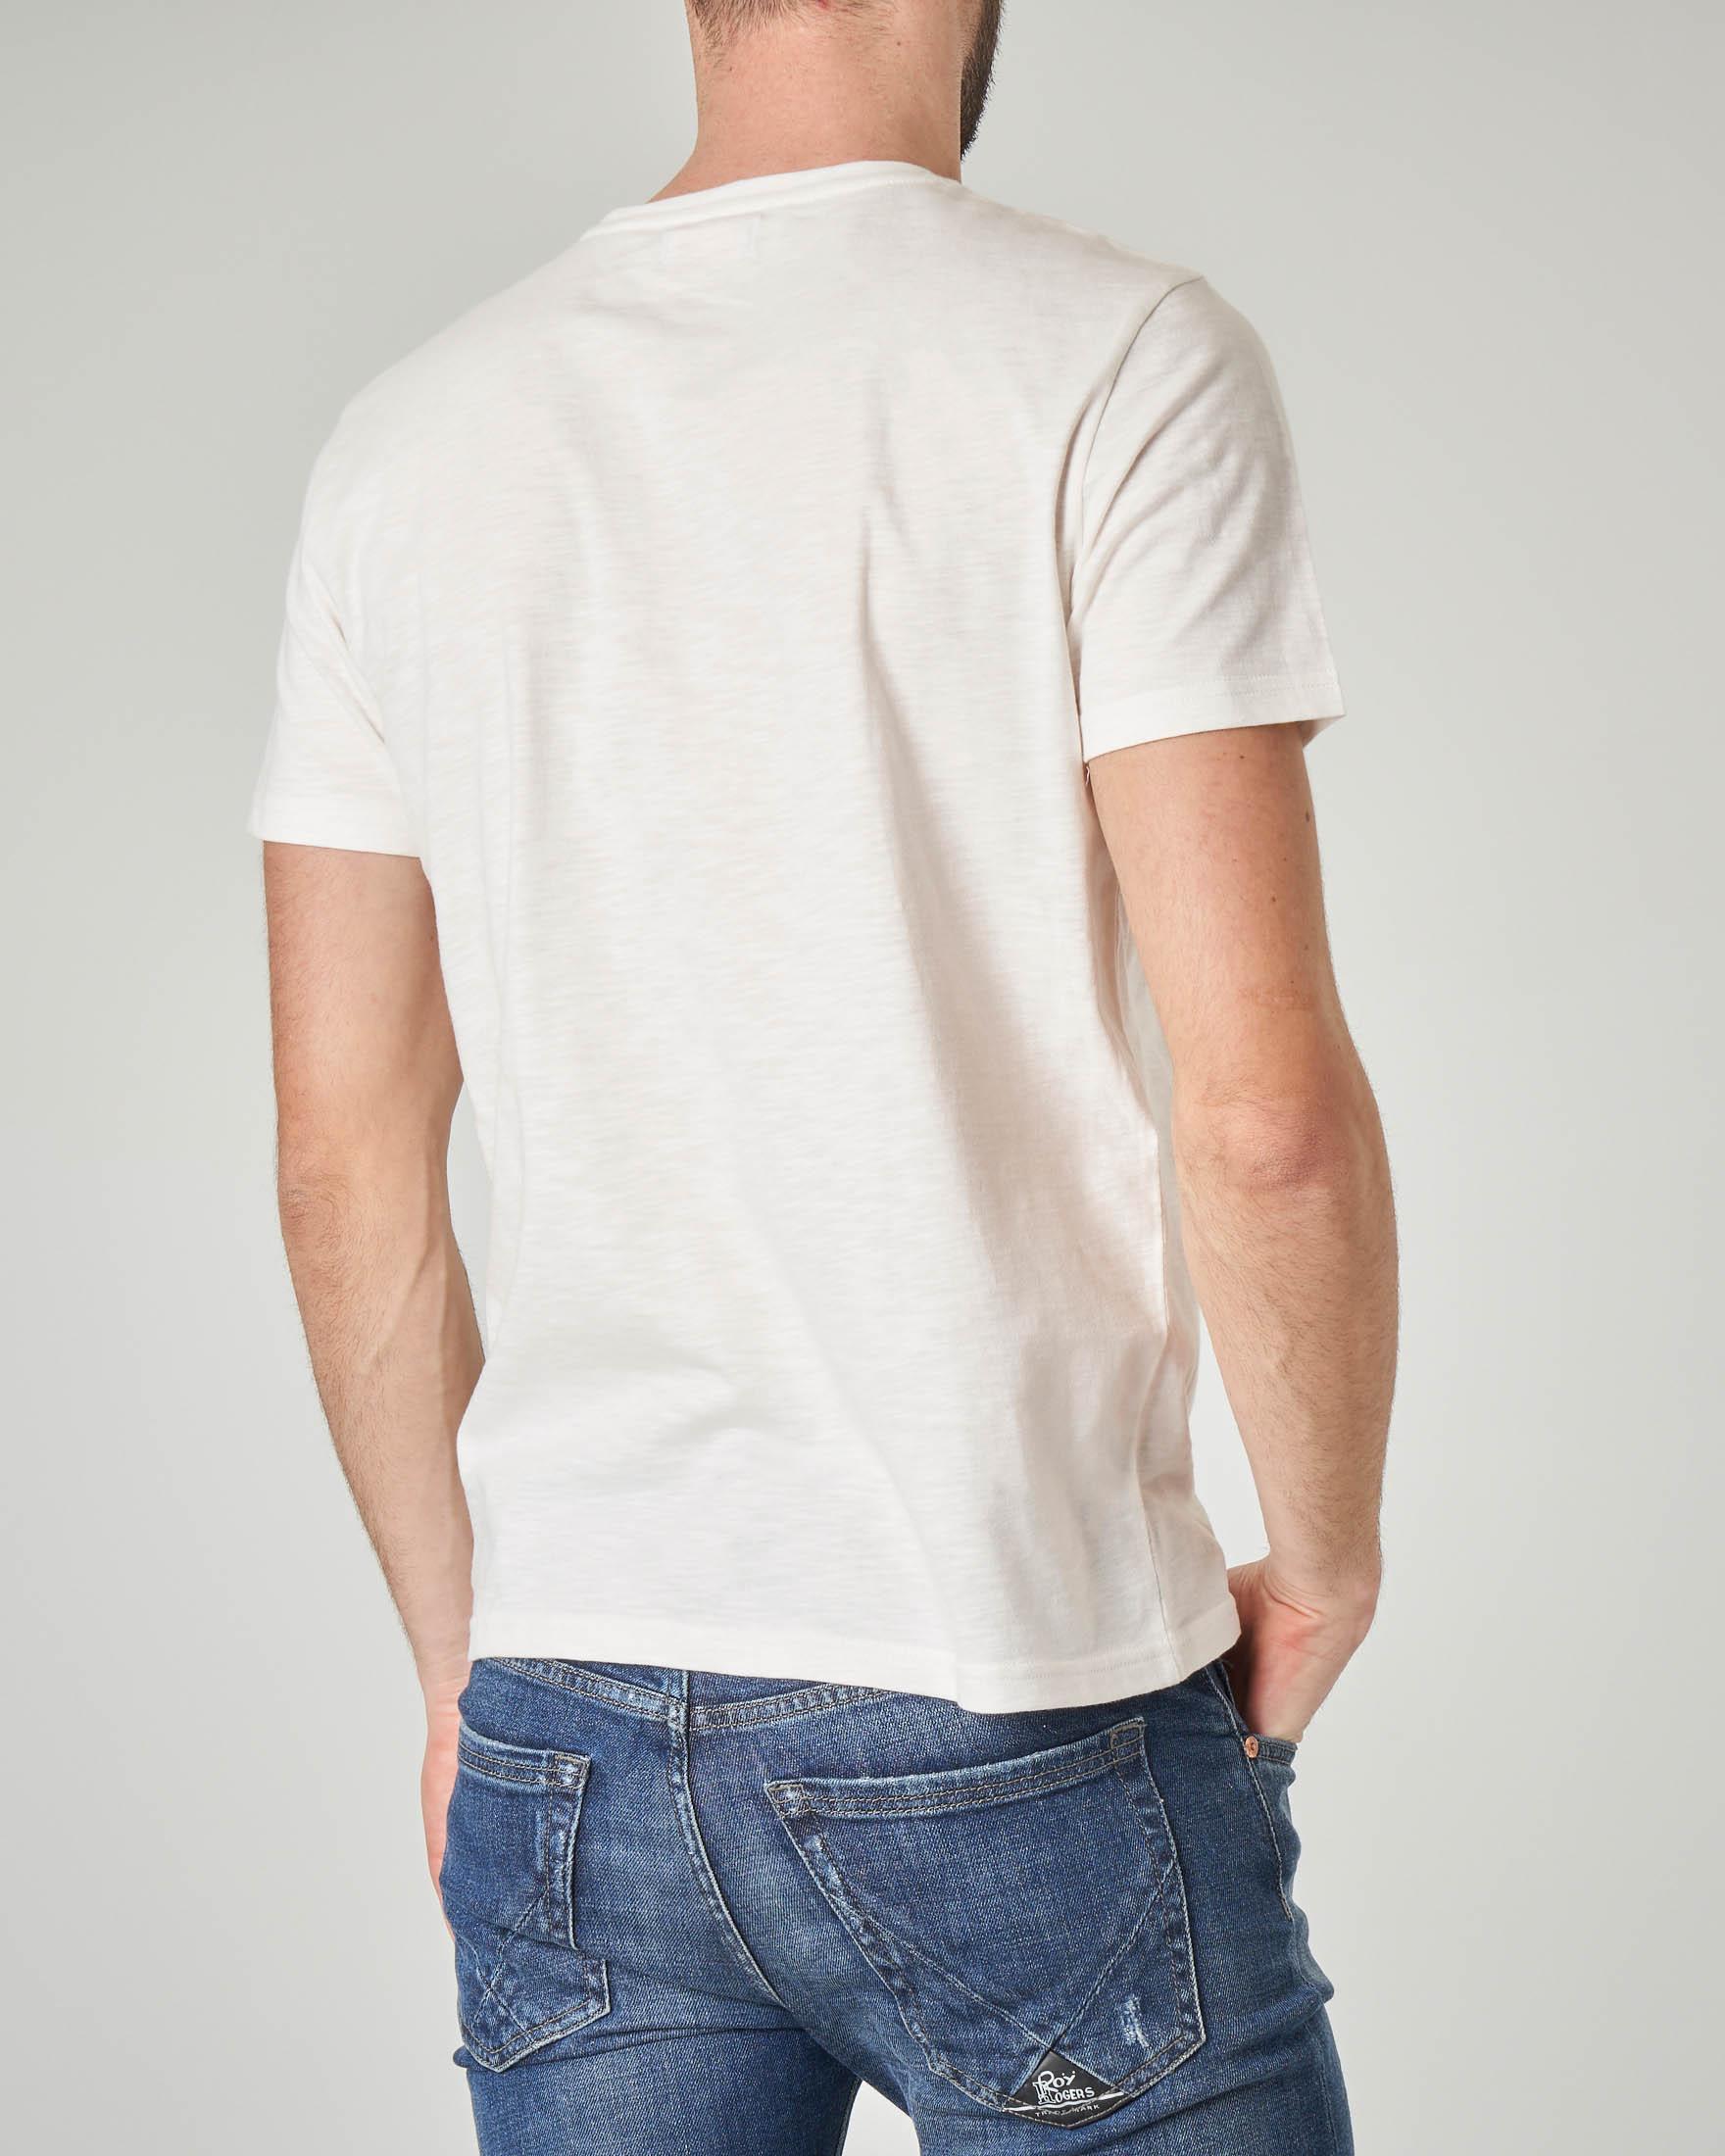 T-shirt bianca con stampa balena